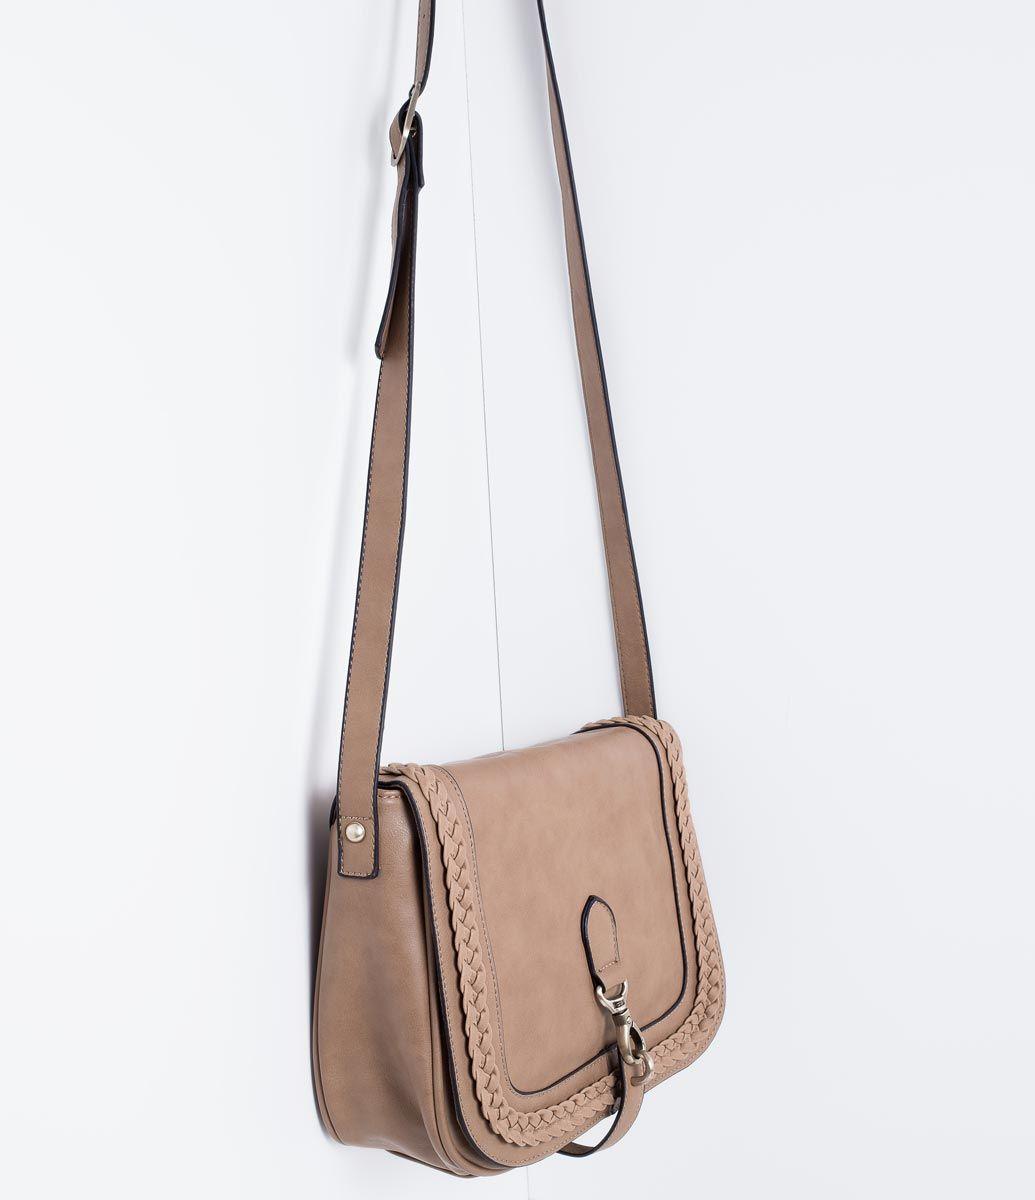 Bolsa Feminina A Tira Colo : Bolsa feminina transversal com lapela lojas renner